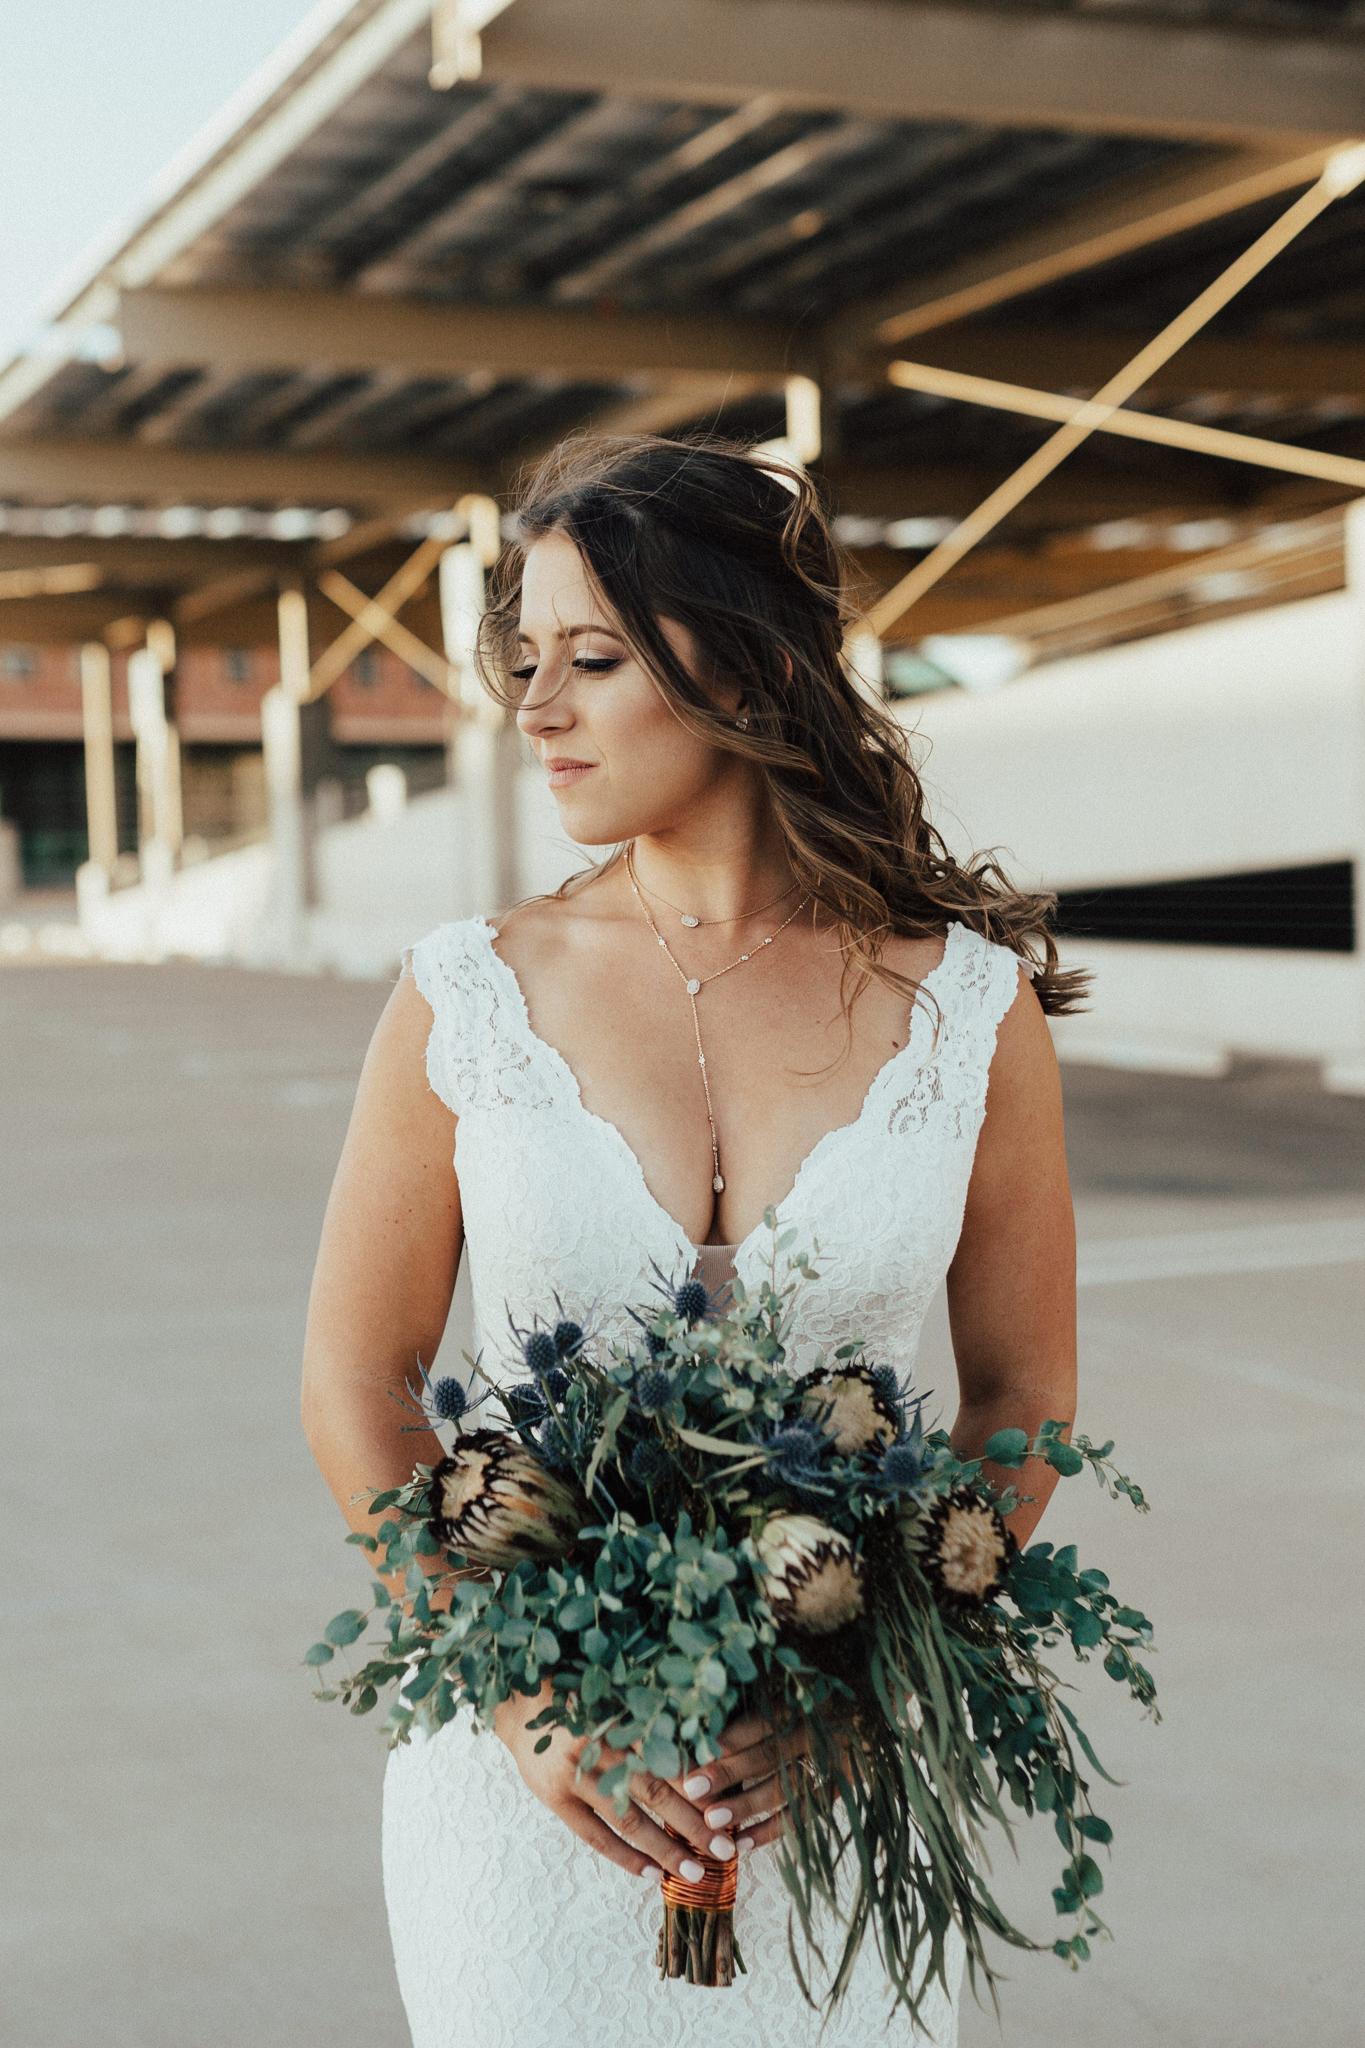 Arizona-Adventure-Elopement-Wedding-Photographer-118.jpg